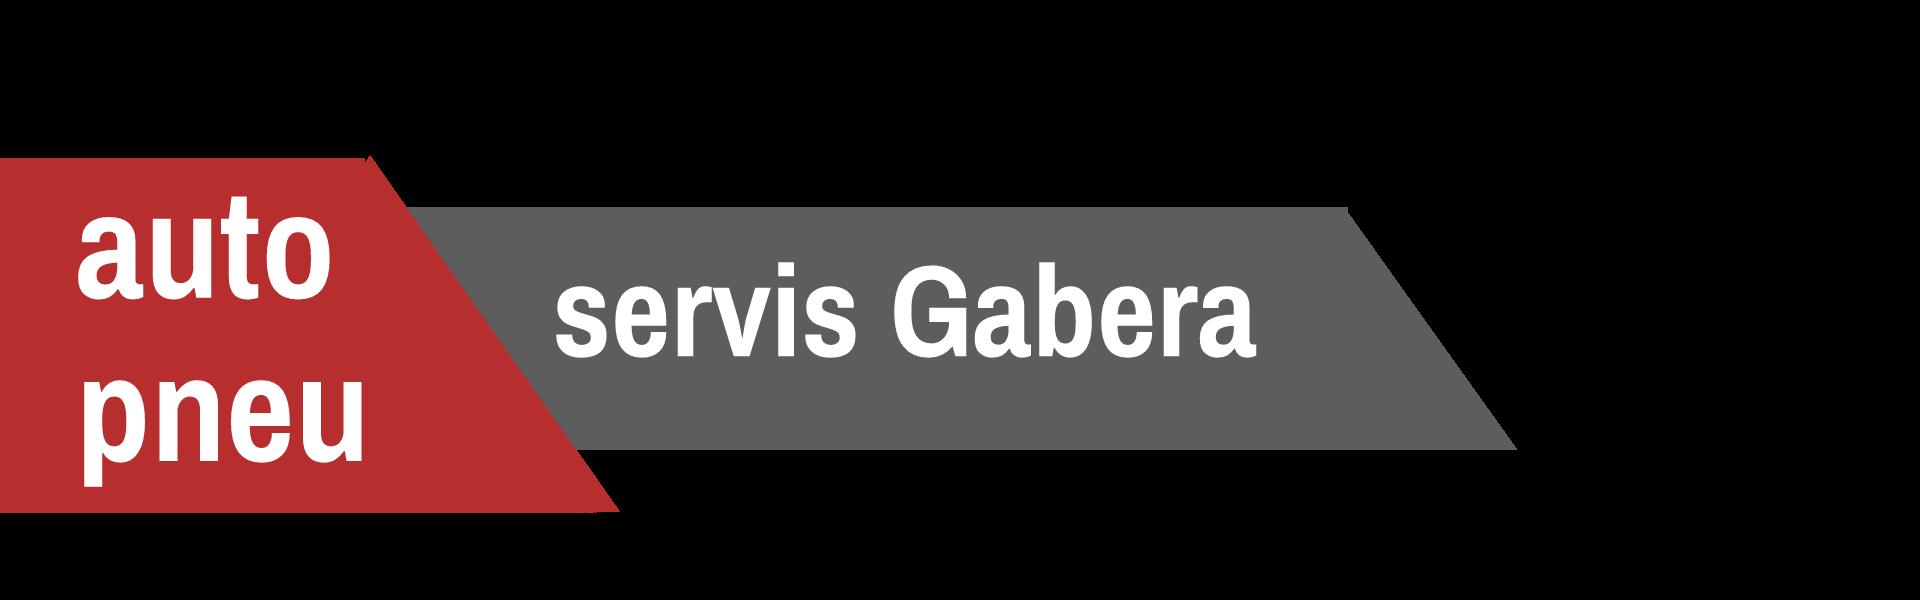 logo firmy AUTOSERVIS GABERA